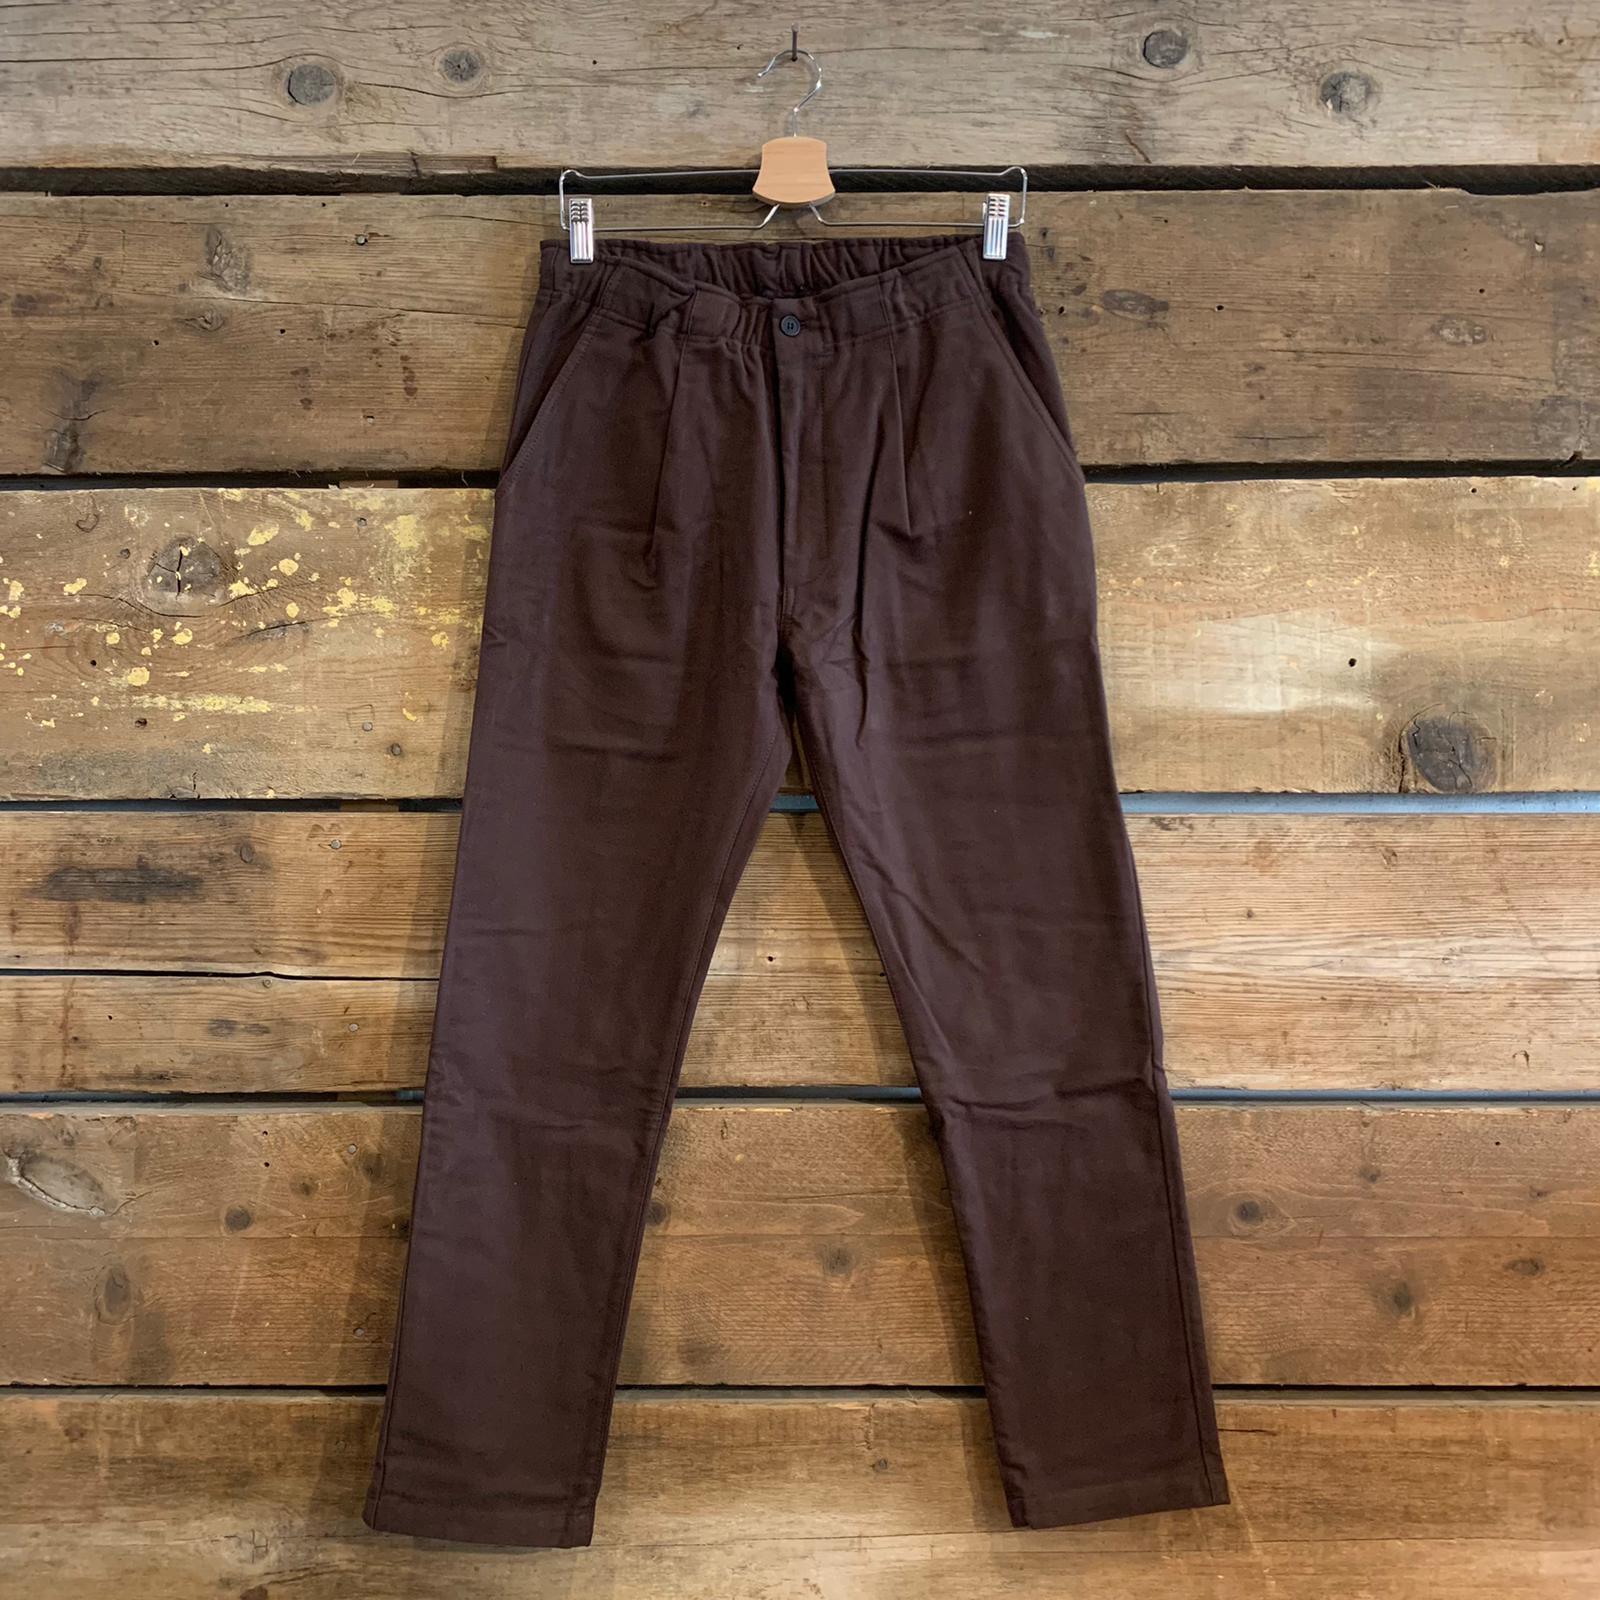 Pantalone Bakery Supplies Lowan Suede Marrone Scuro